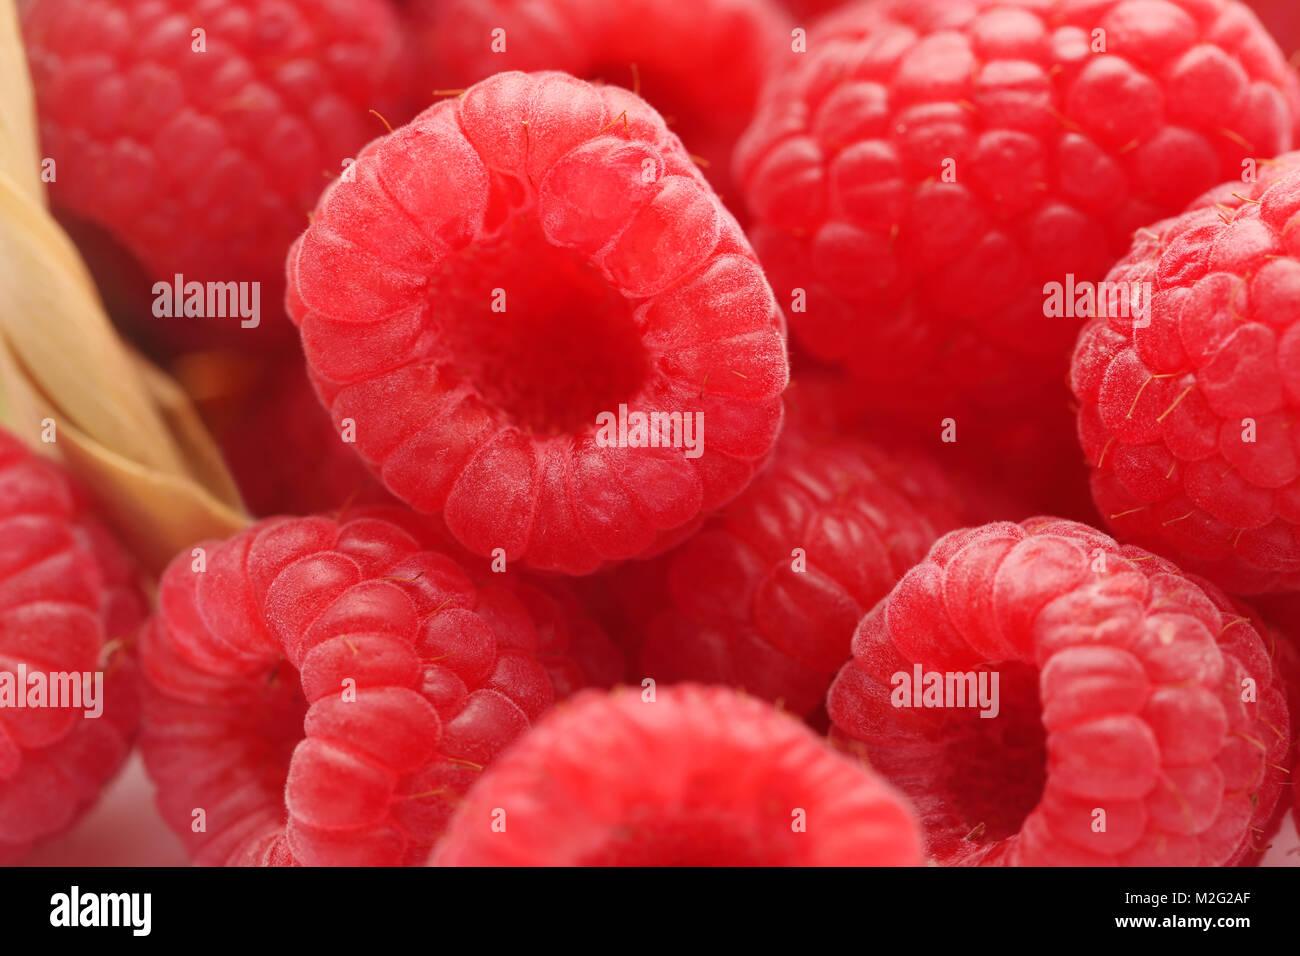 Closeup of some fresh raspberries - Stock Image